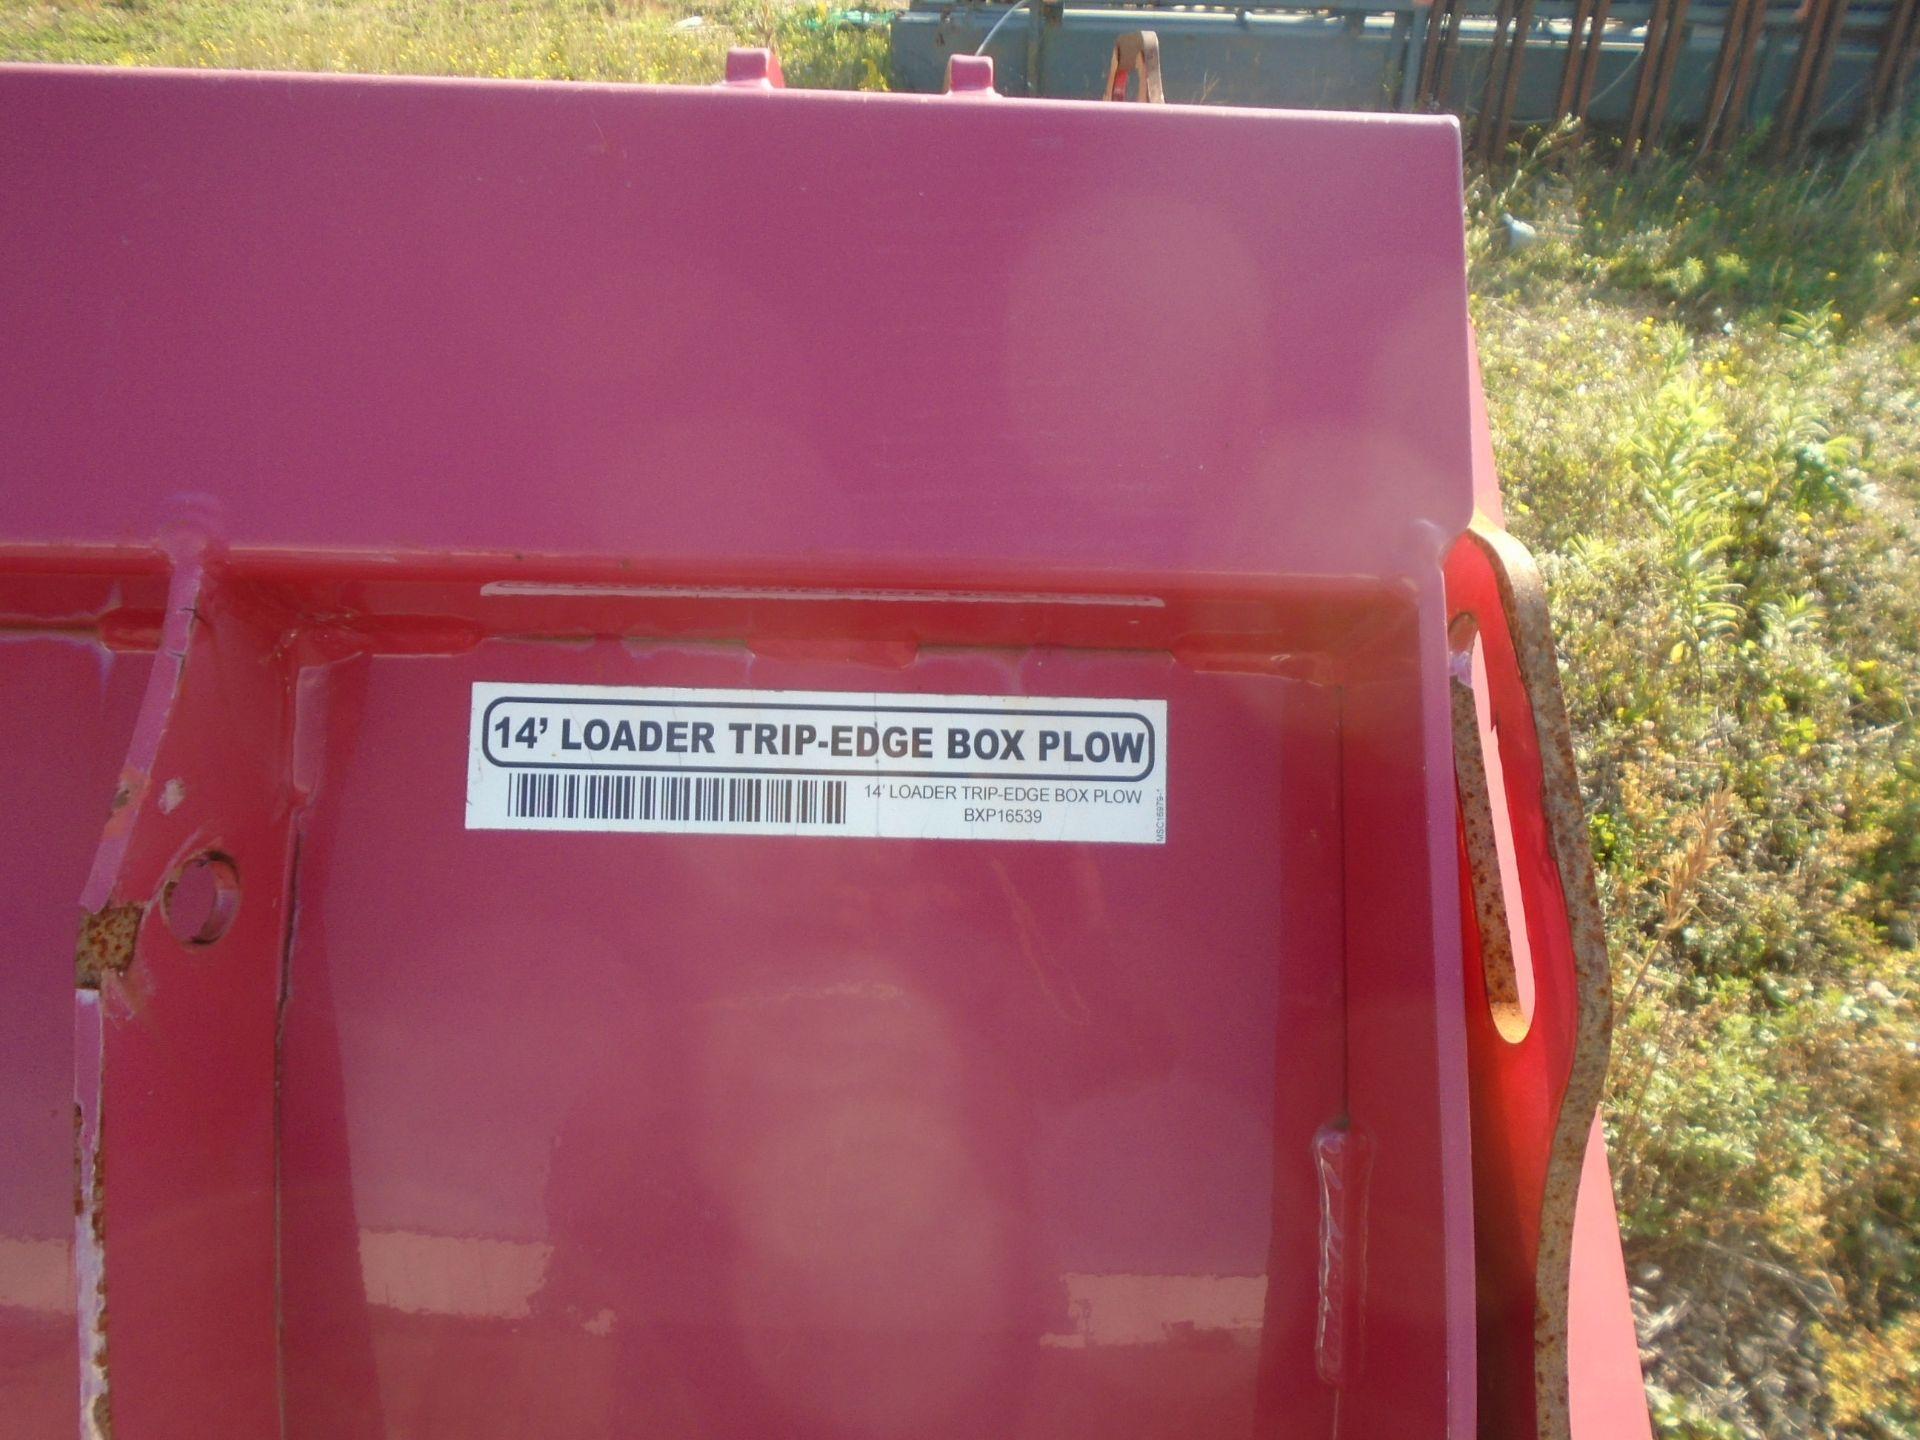 BOSS BXP16539 14' TRIP EDGE PLOW ATTACHMENT - Image 3 of 3